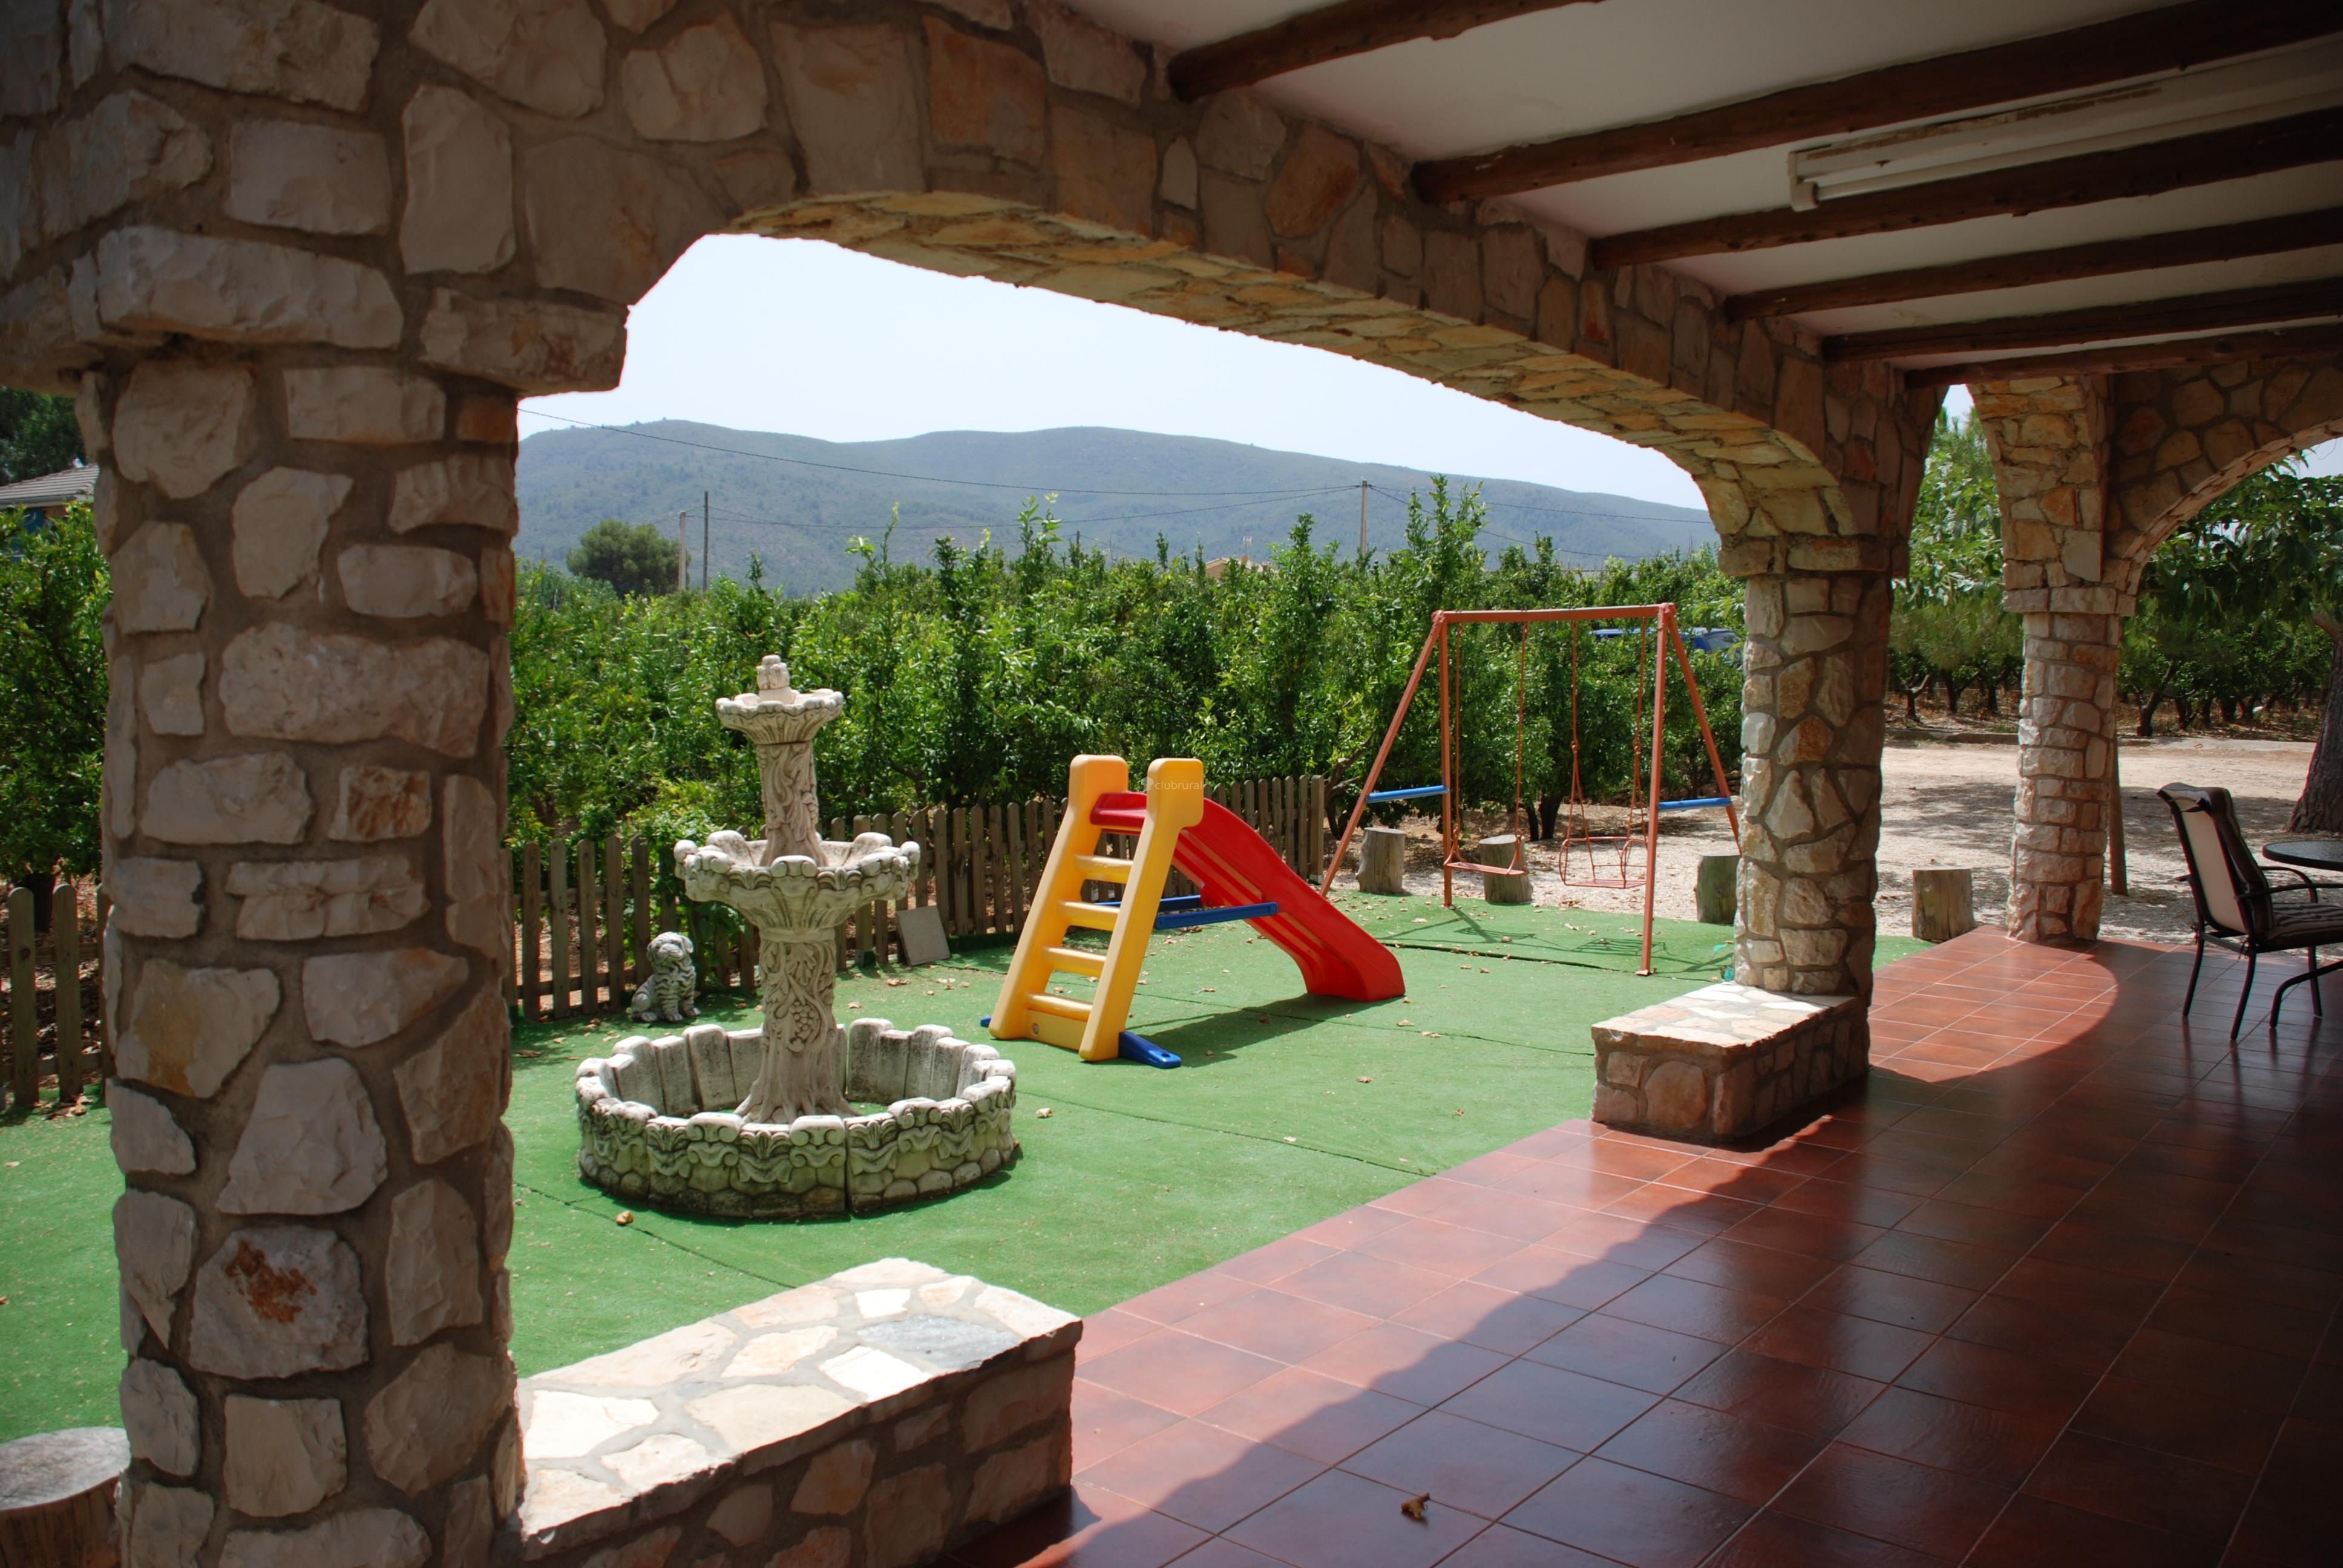 Fotos de el carrascal valencia anna clubrural - Ofertas casas rurales valencia ...